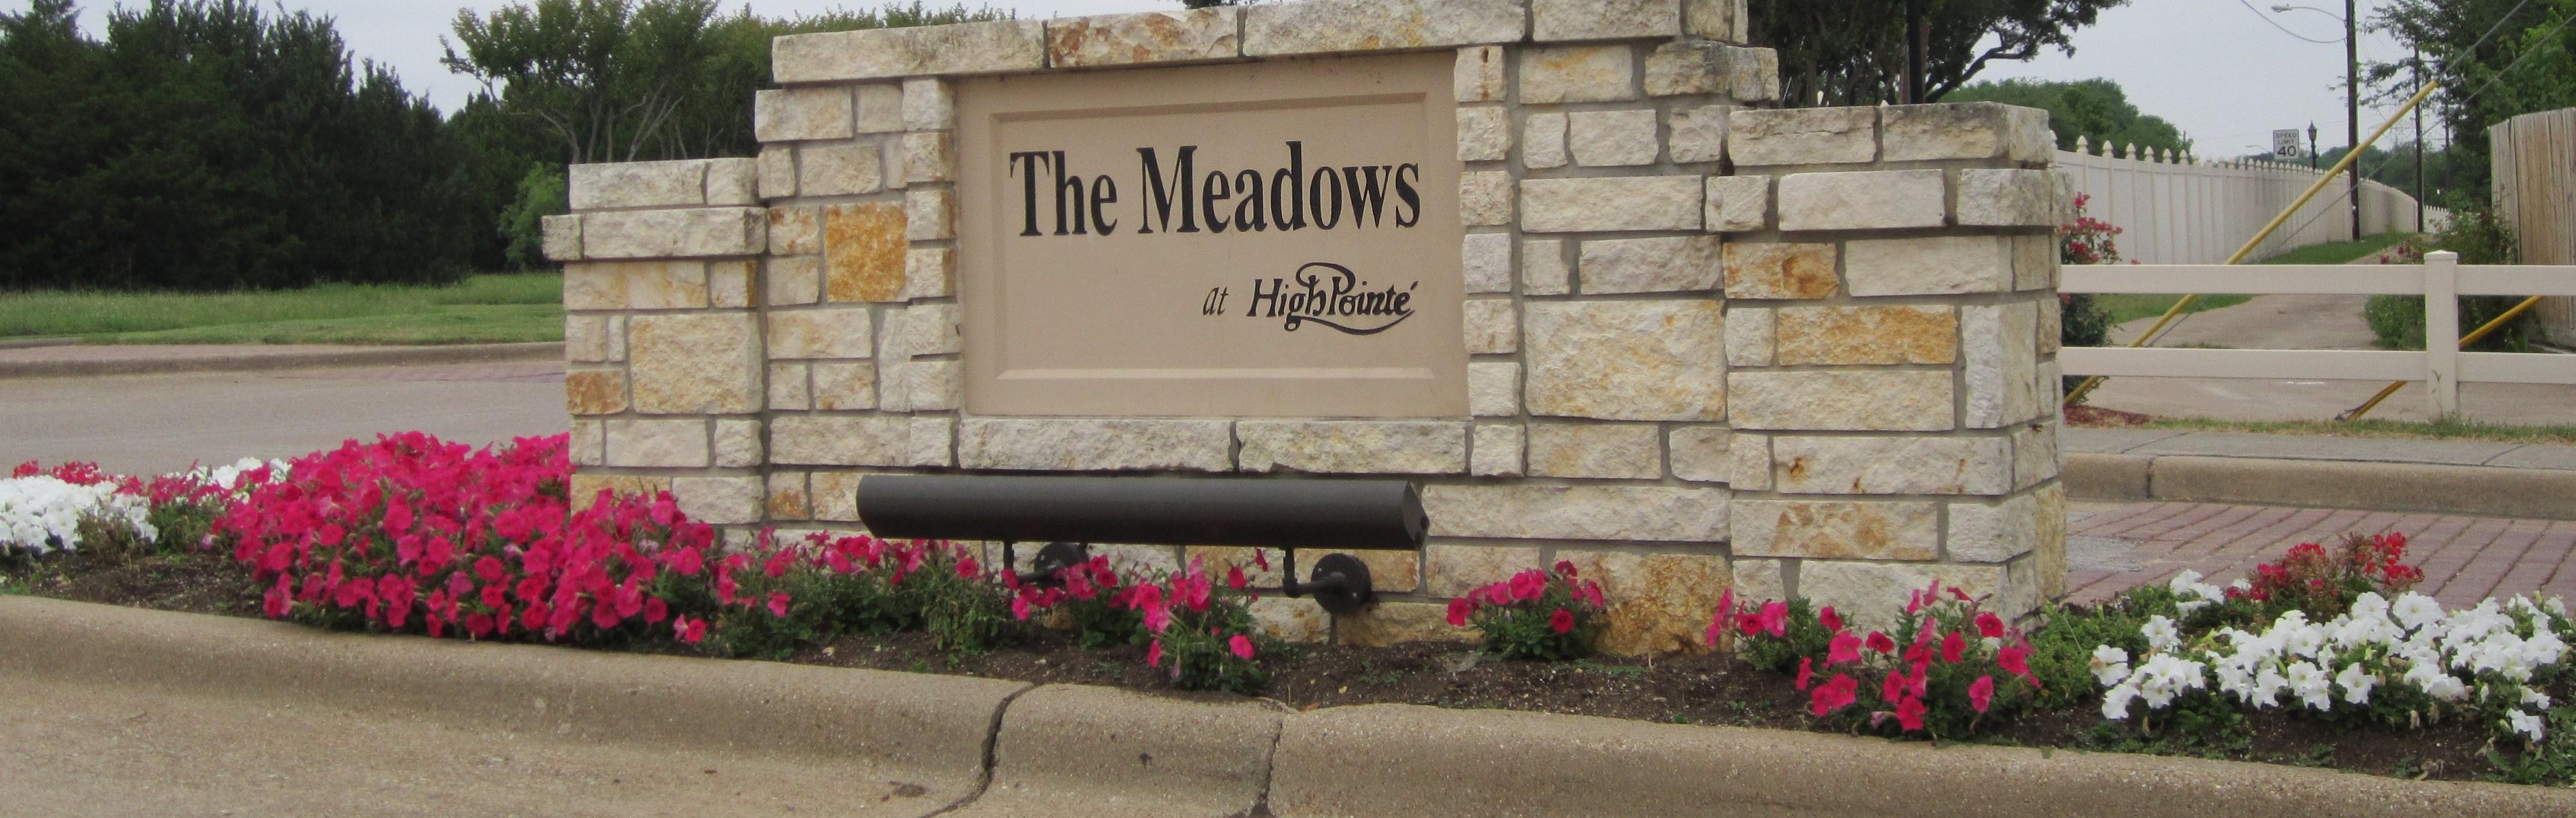 Meadows At High Pointe Ph 2 OA cover